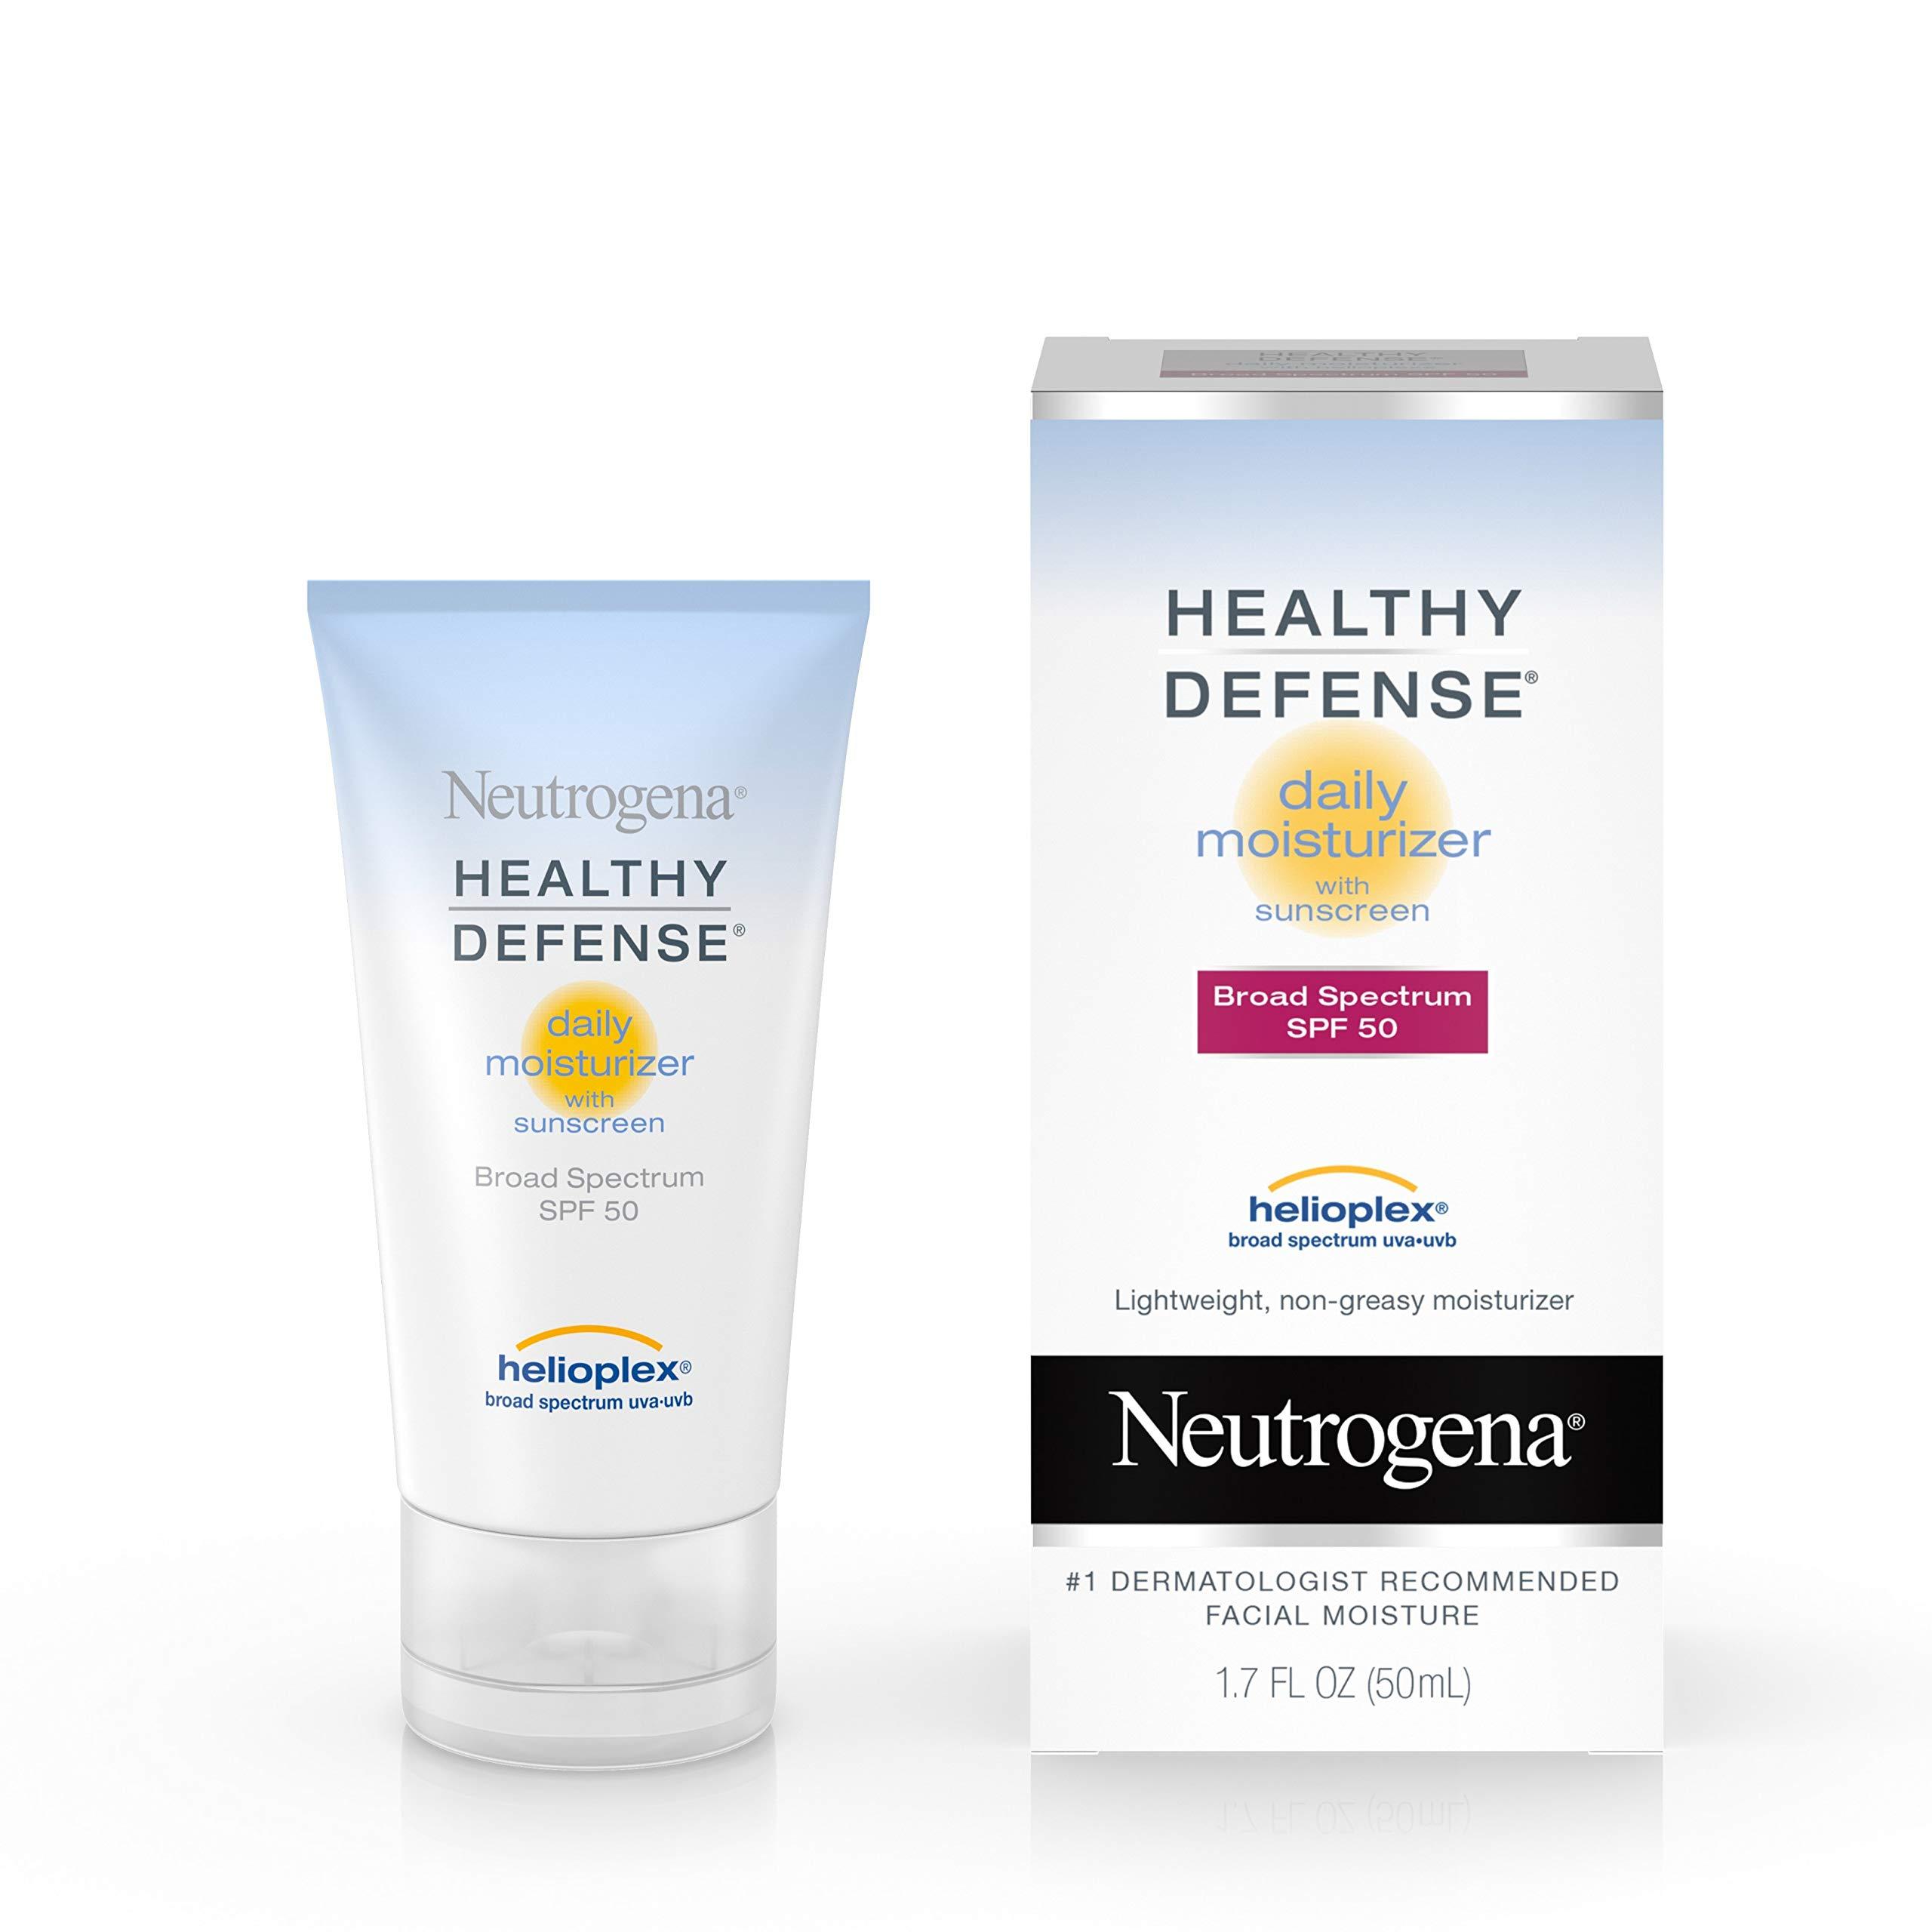 Neutrogena Healthy Defense Daily Moisturizer with Broad Spectrum SPF 50 Sunscreen, Vitamin E & Anti-Oxidants, Lightweight, Non-Greasy & Hypoallergenic, 1.7 fl. oz by Neutrogena